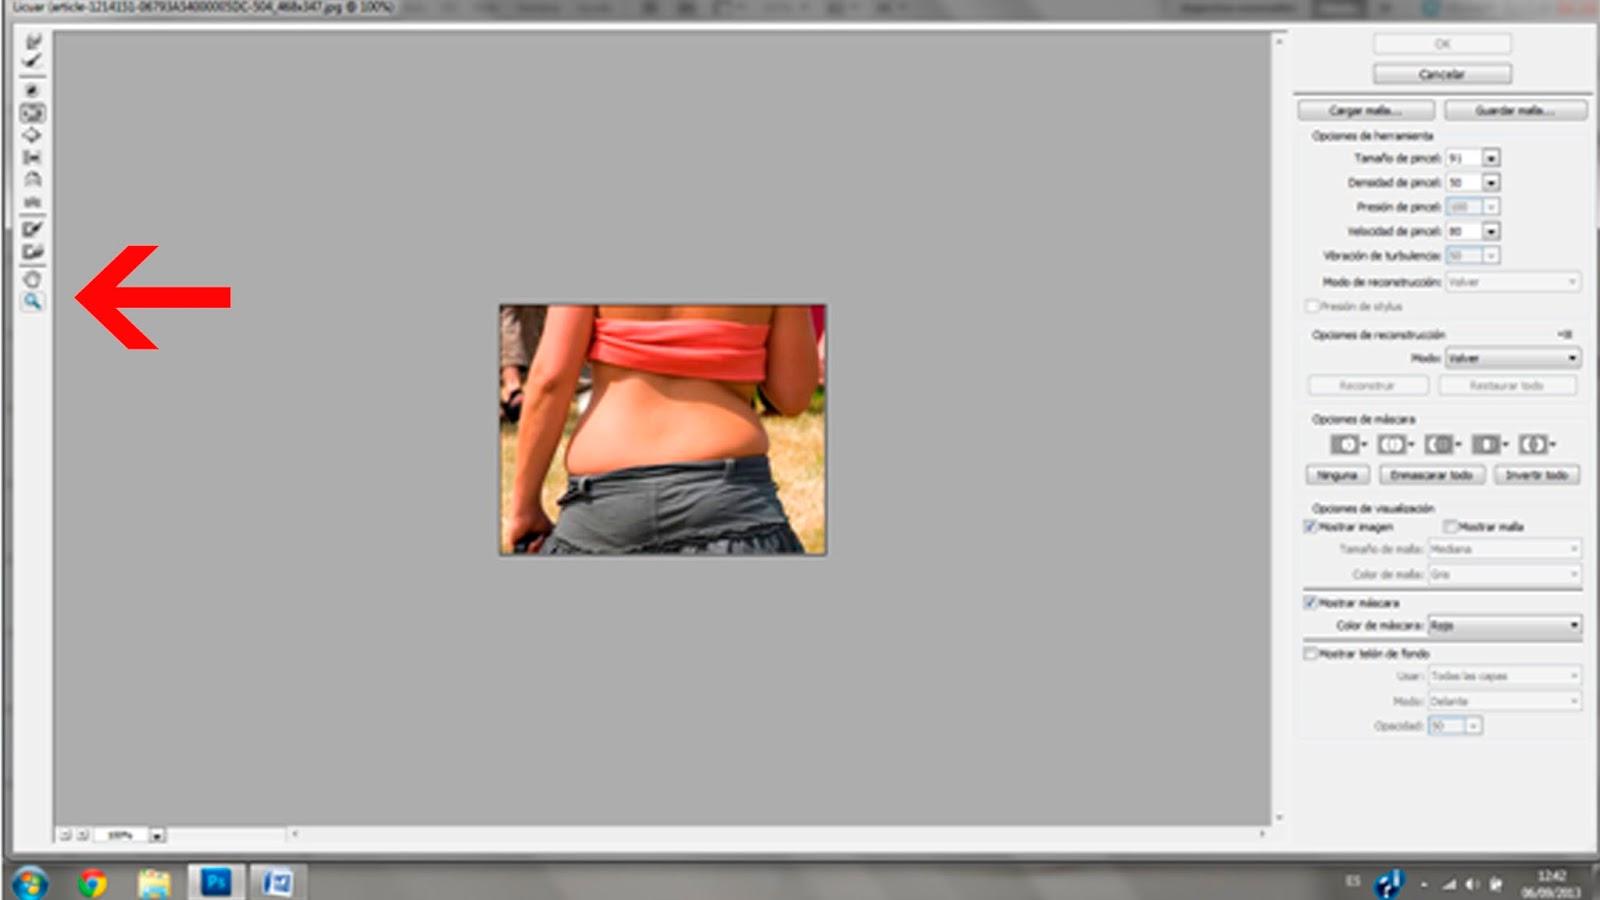 Dieta para perder grasa abdominal semanal obligar